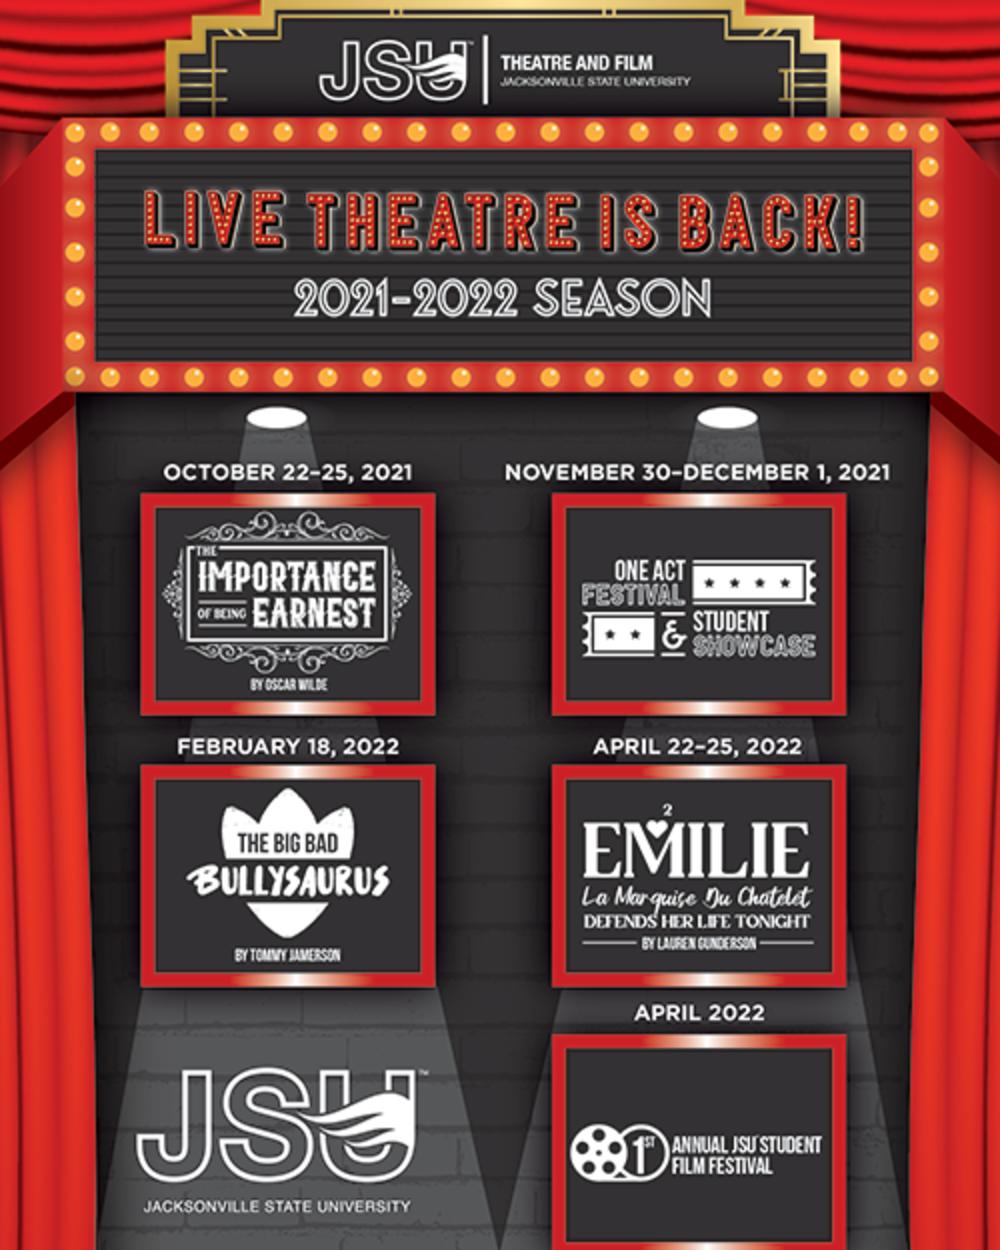 Season poster for JSU Theatre and film Season